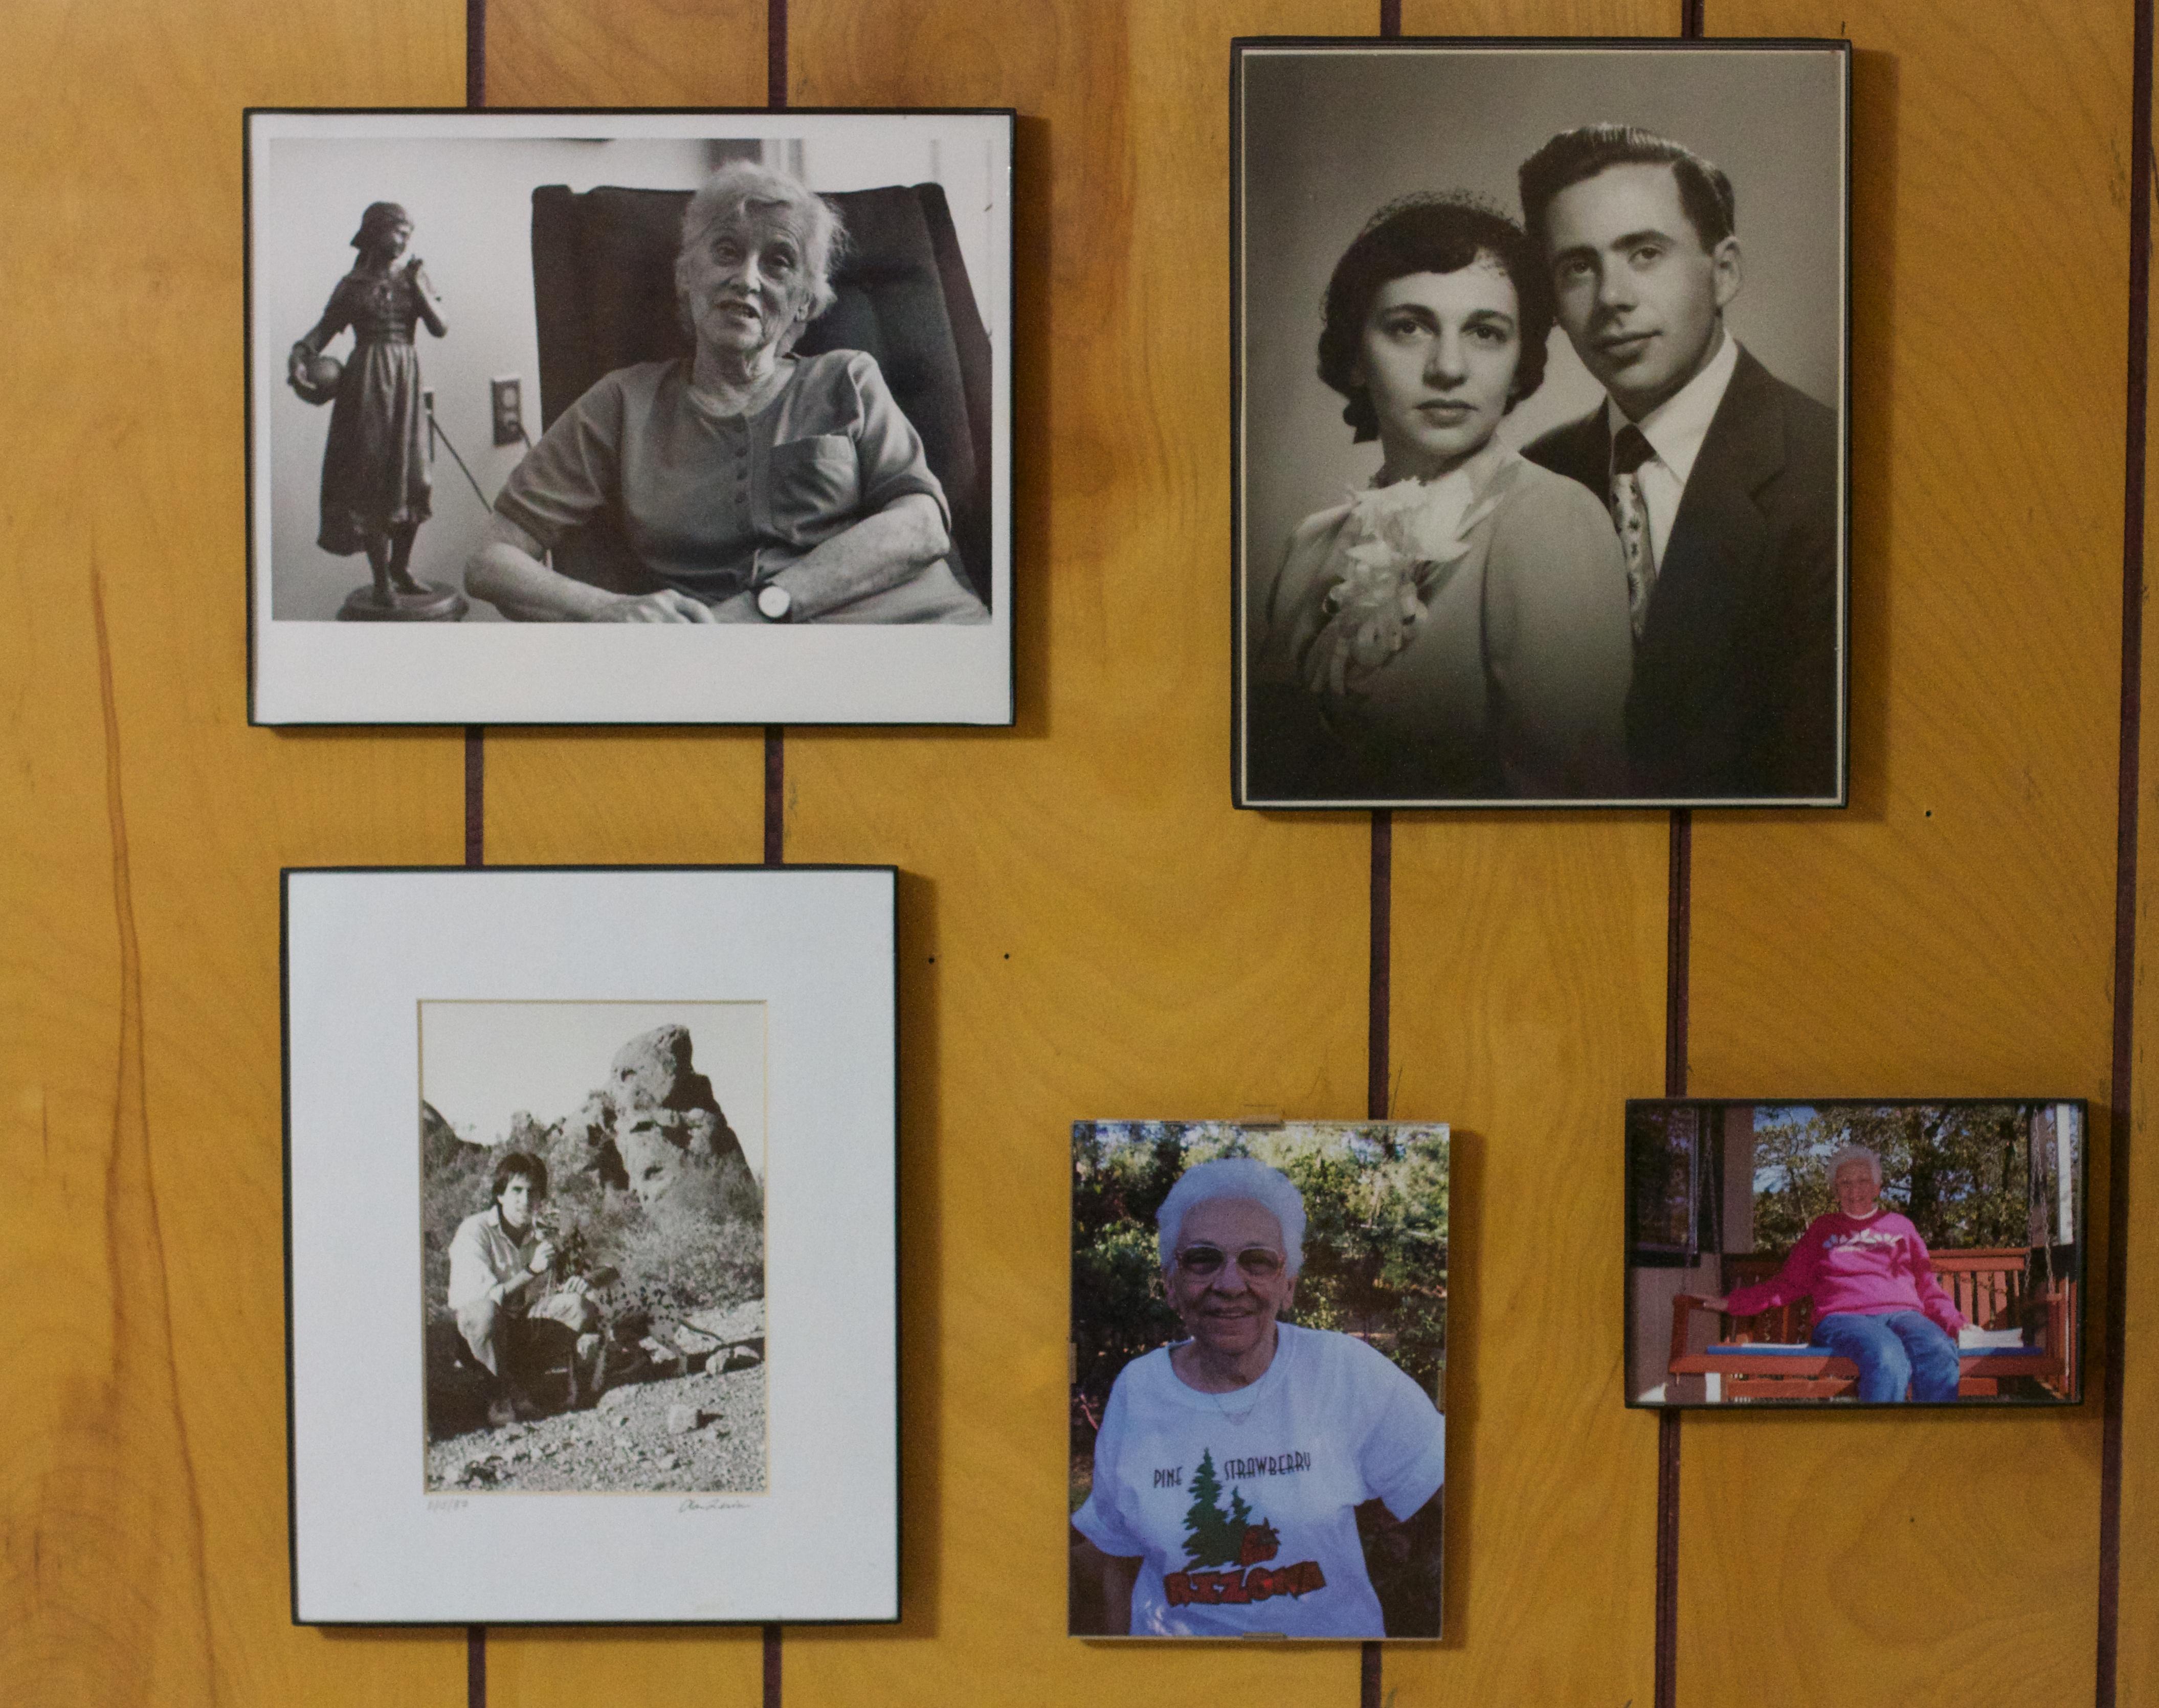 gro kreis collage bilderrahmen zeitgen ssisch bilderrahmen ideen. Black Bedroom Furniture Sets. Home Design Ideas